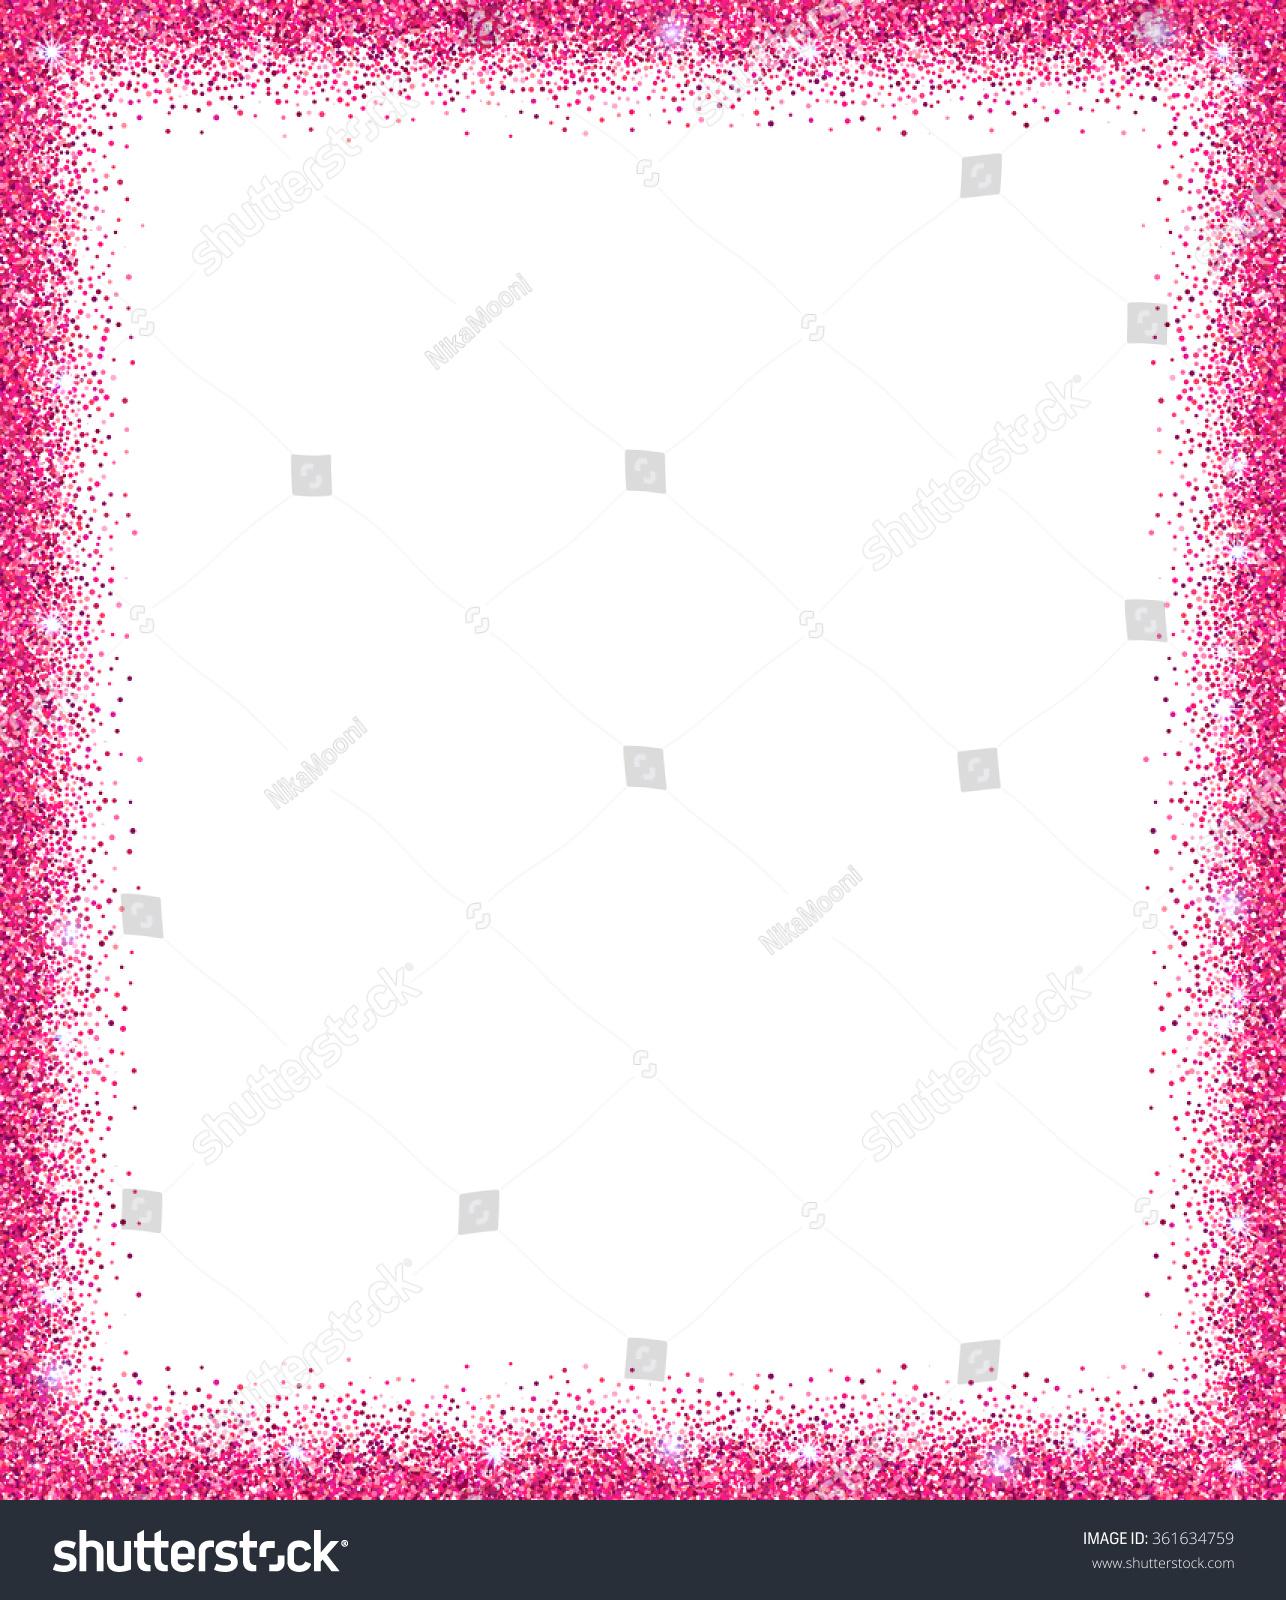 Pink Glitter Background Pink Sparkle Frame Stock Vector ...